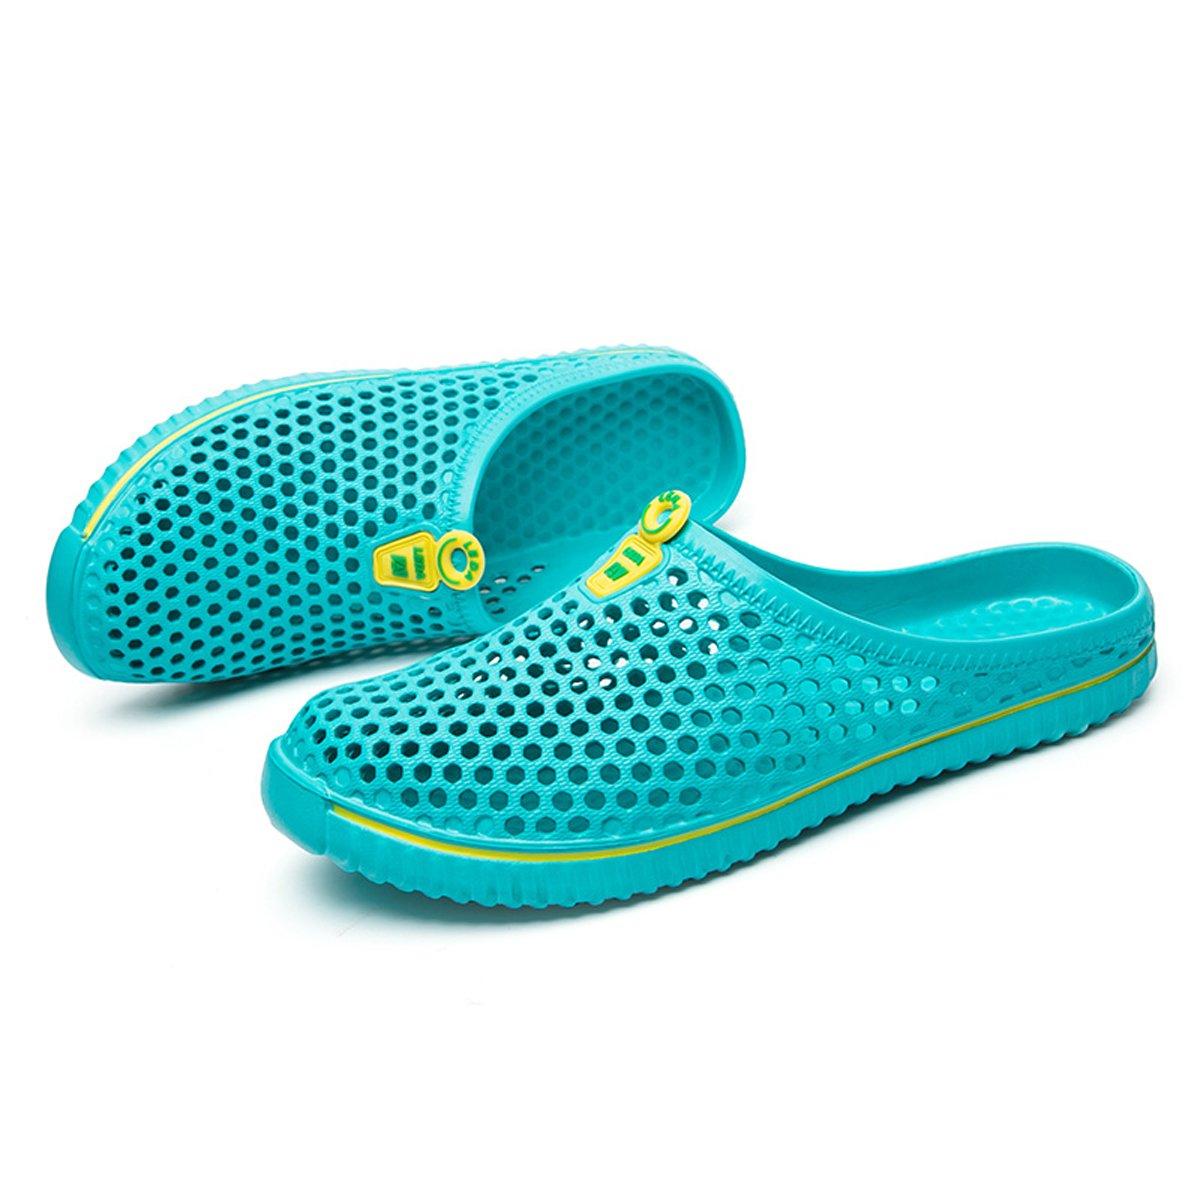 BADIER Men Women Mesh Garden Clog Shoe Walking Beach Slippers